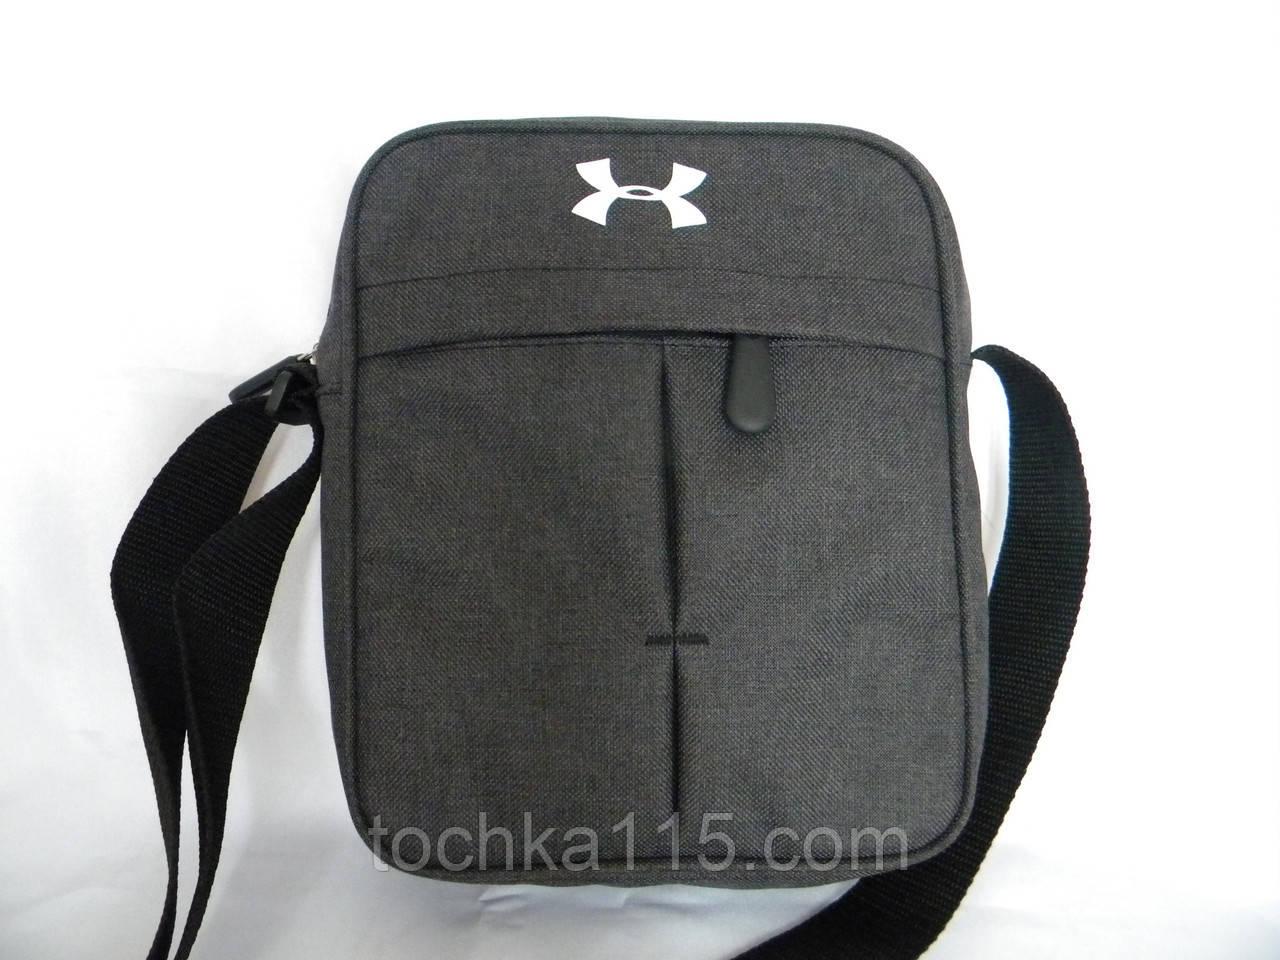 Прочная сумка через плече Under Armour, сумка на плече, сумка мужская реплика